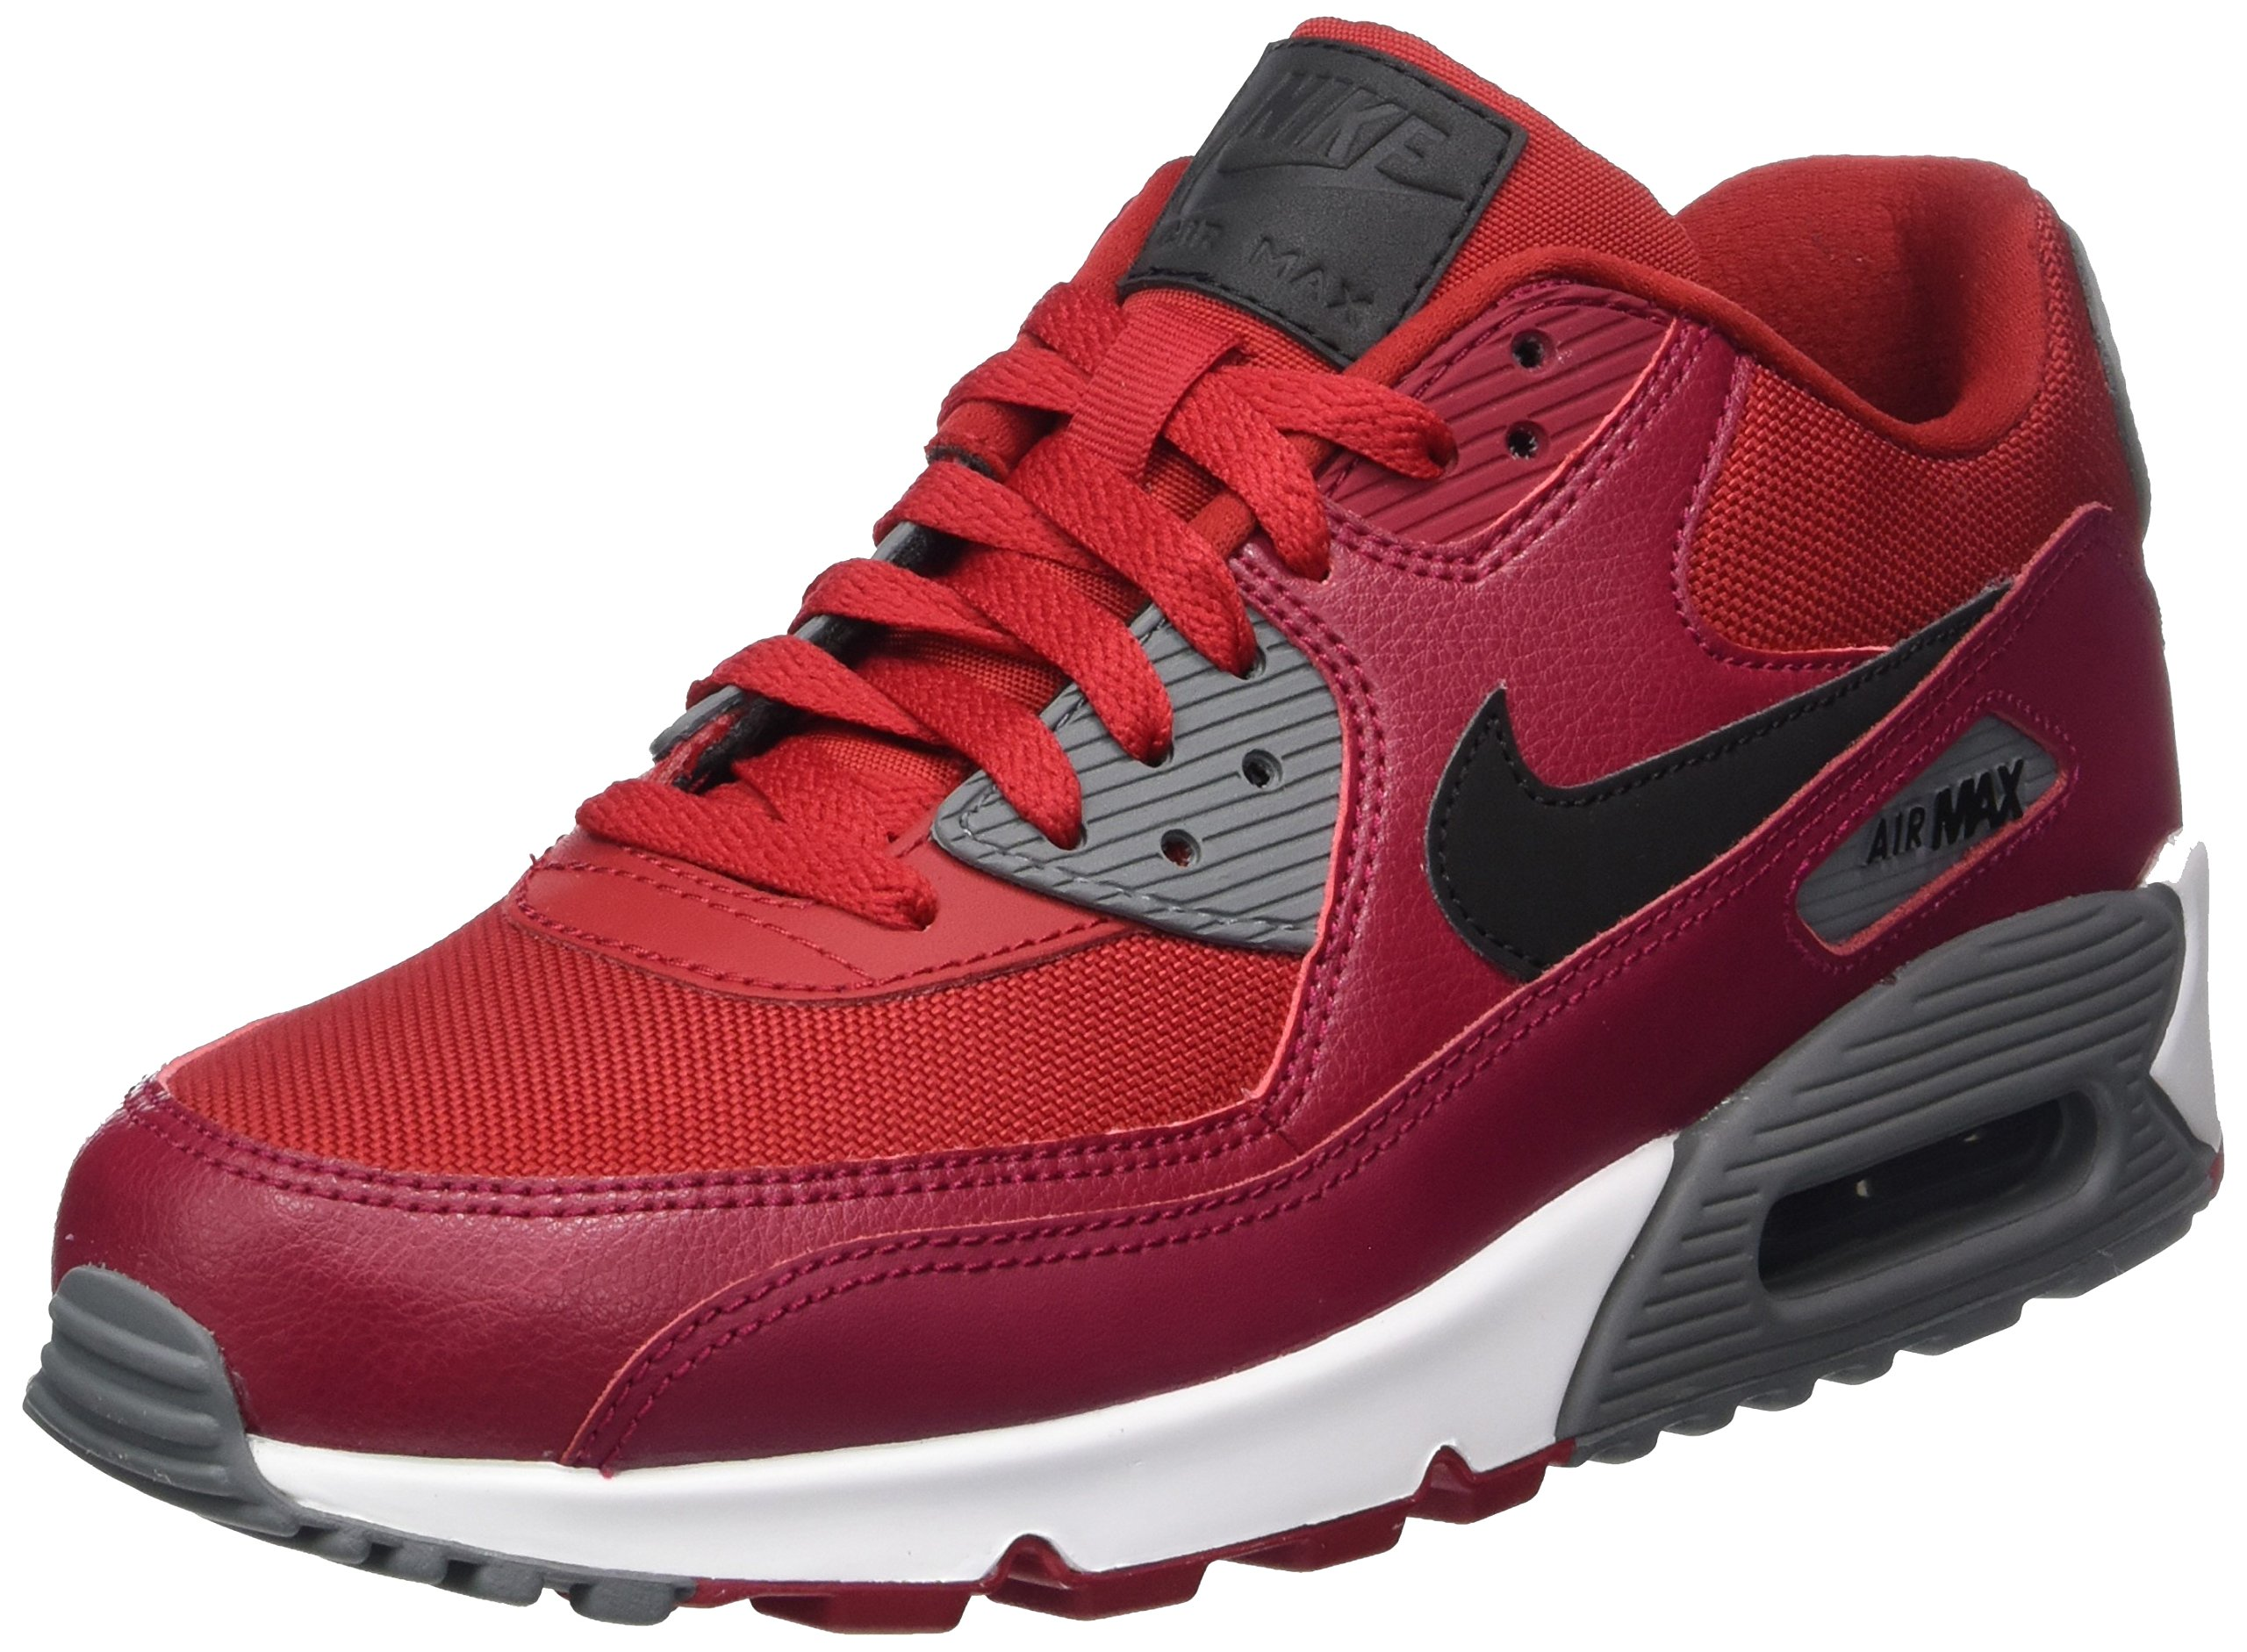 Nike Men's Air Max 90 Ultra 2.0 Essential Black Dark Grey Ankle High Fashion Sneaker 8M